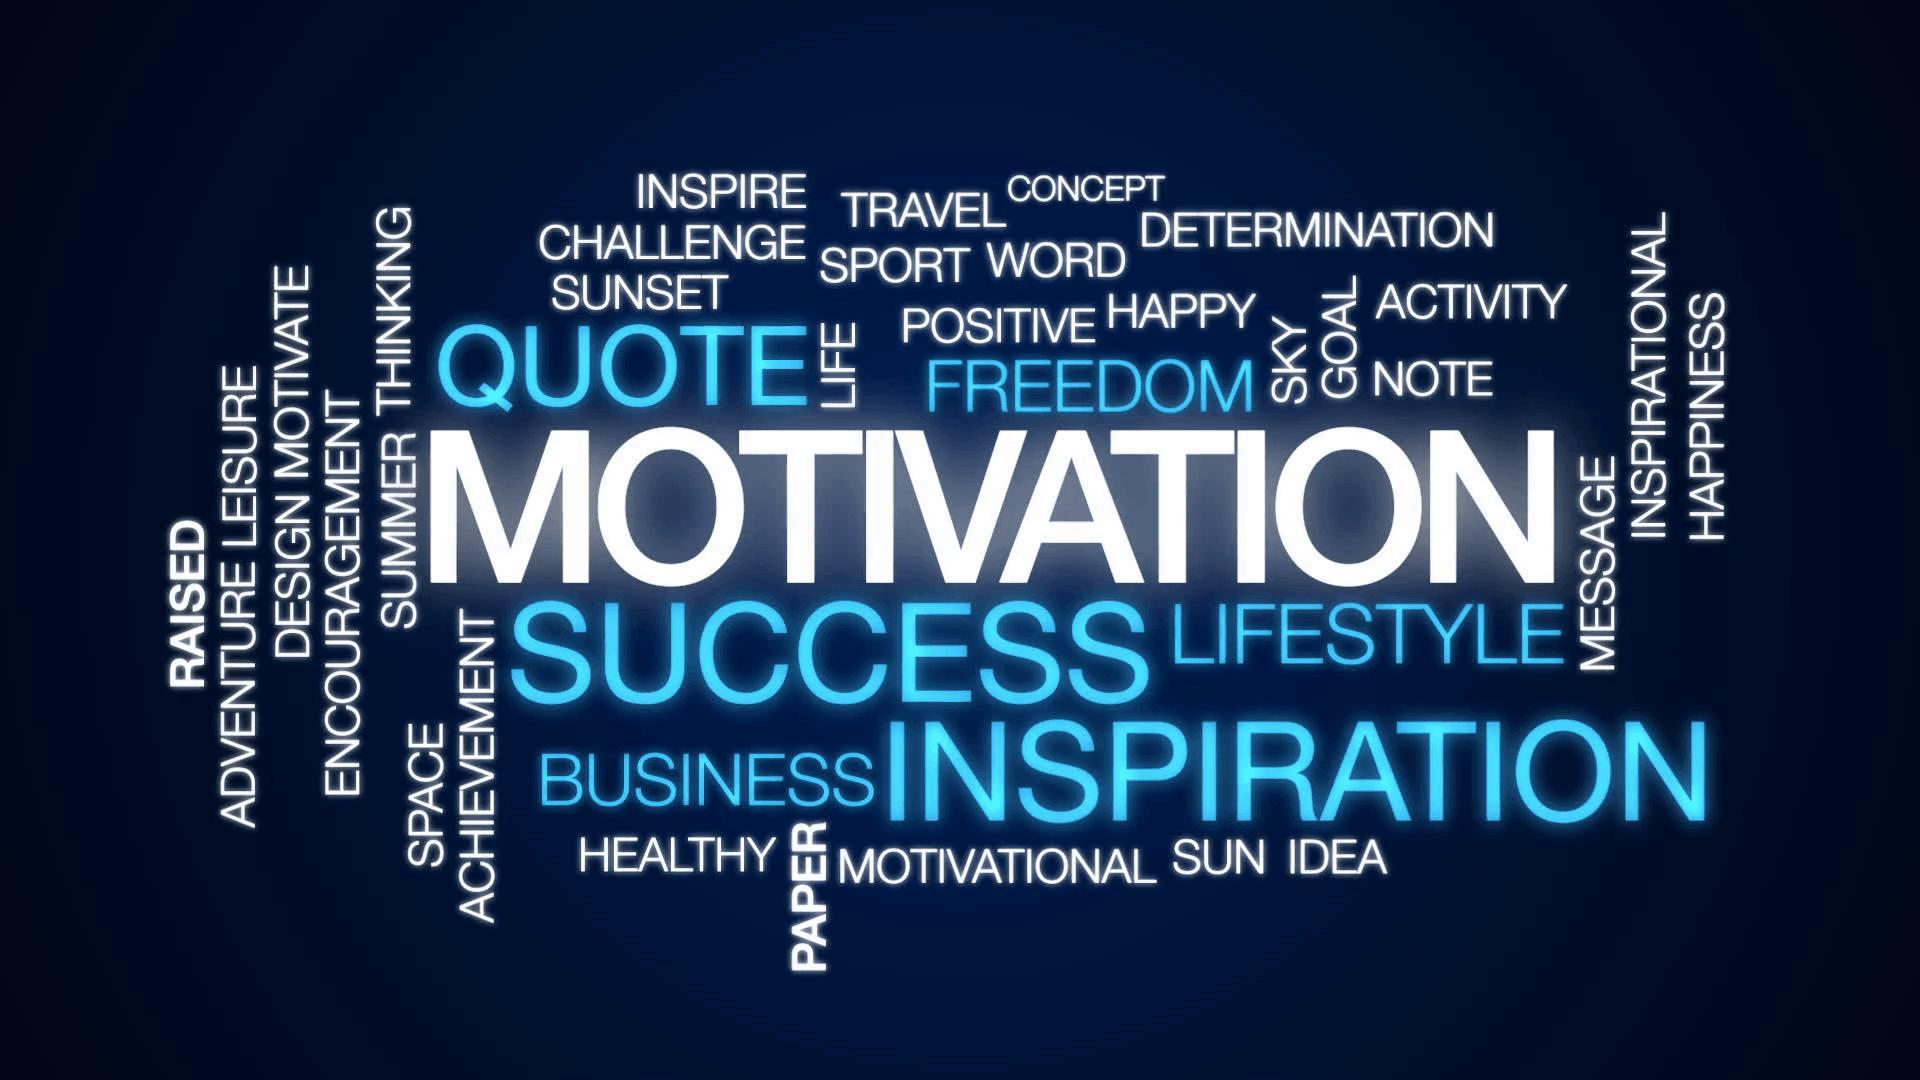 Free Motivation Letter Template- Sample & Example [PDF] | Best Letter Templates